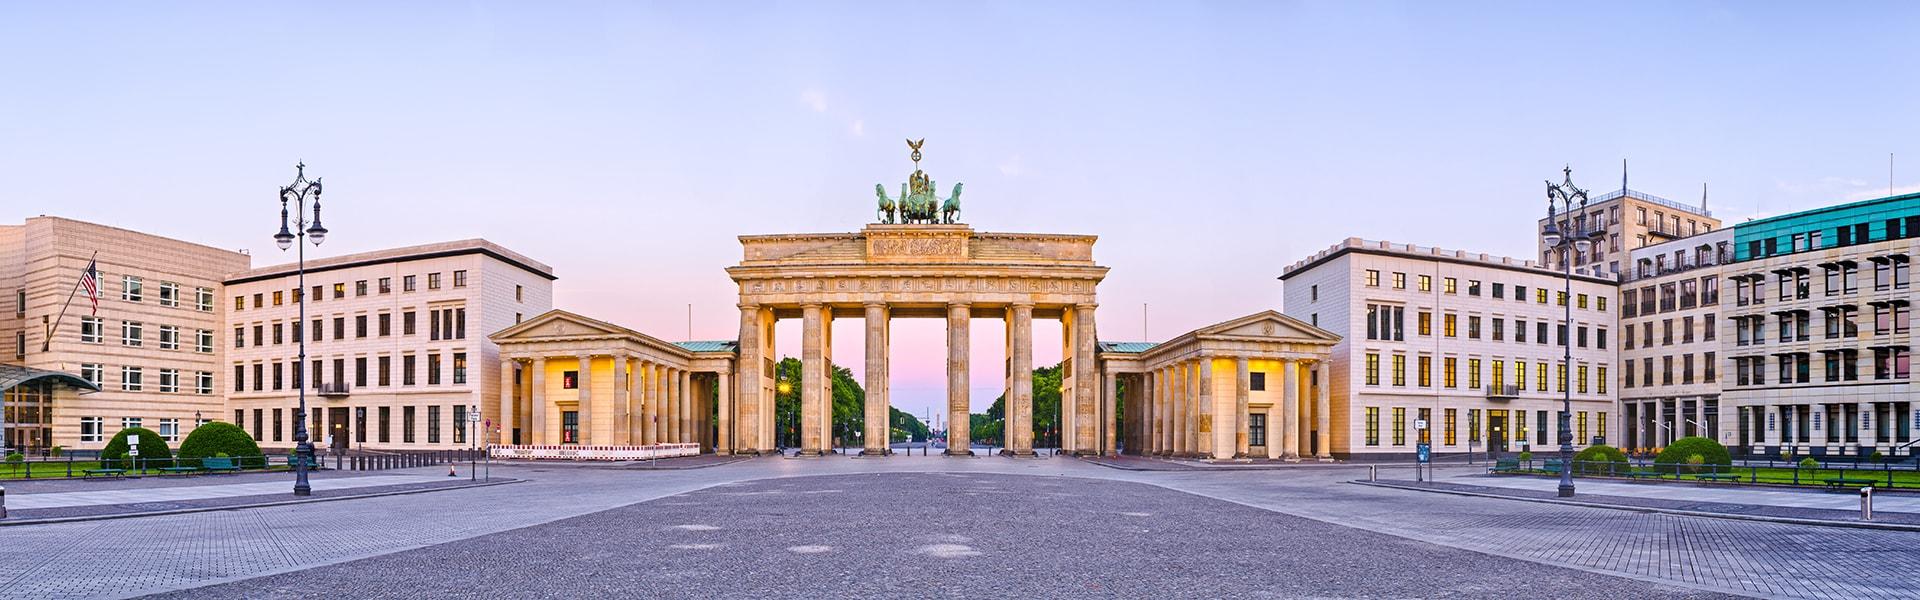 View of Brandenburg Gate in Berlin